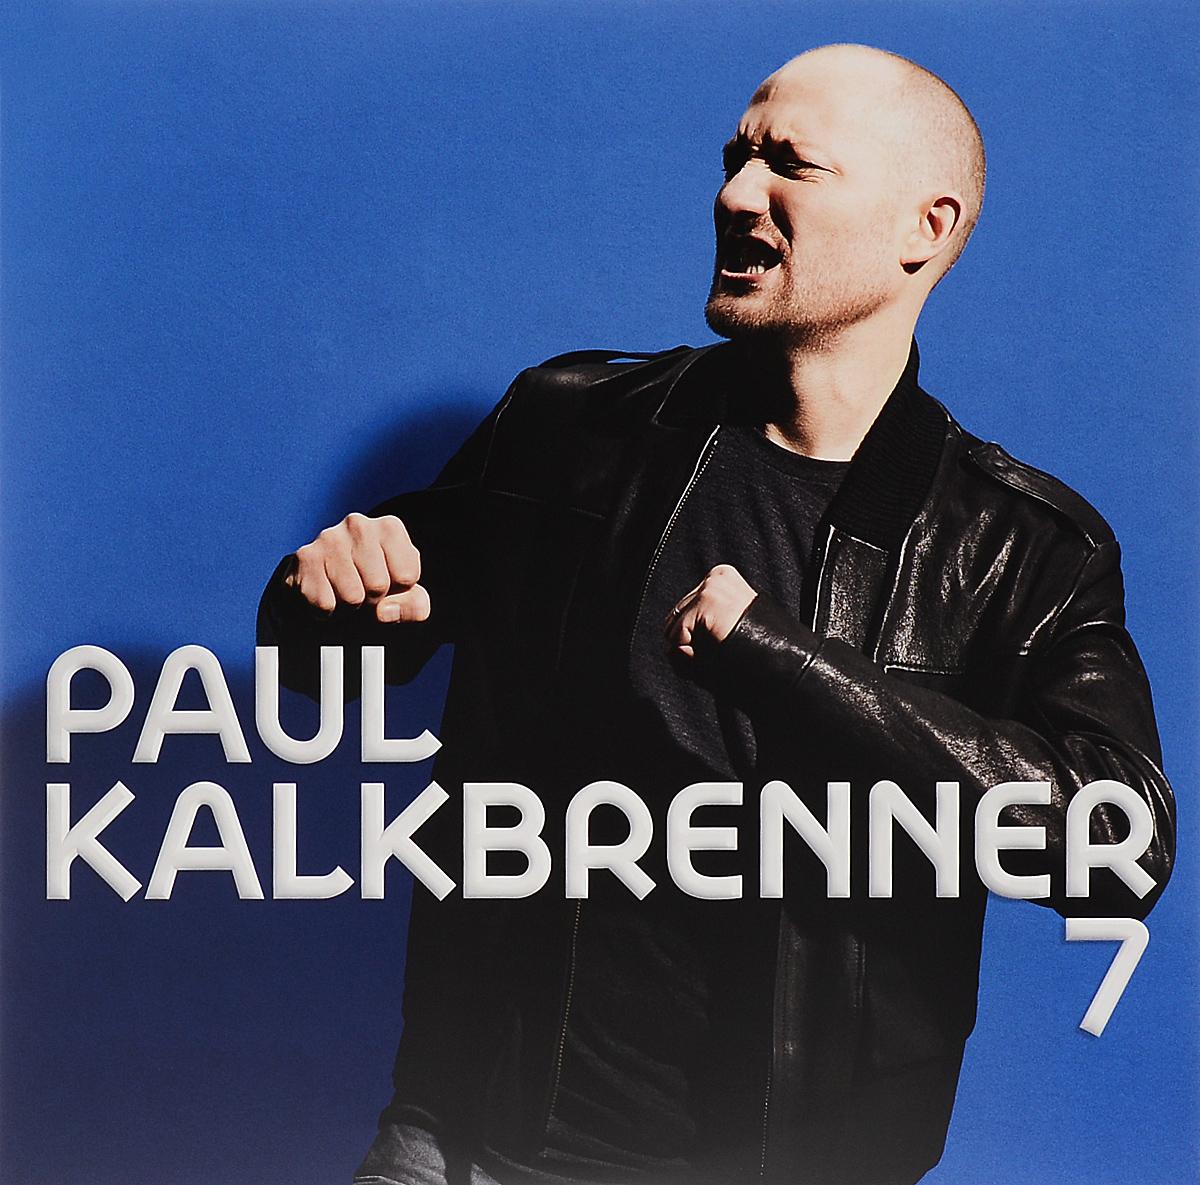 Paul Kalkbrenner. 7 (3 LP)